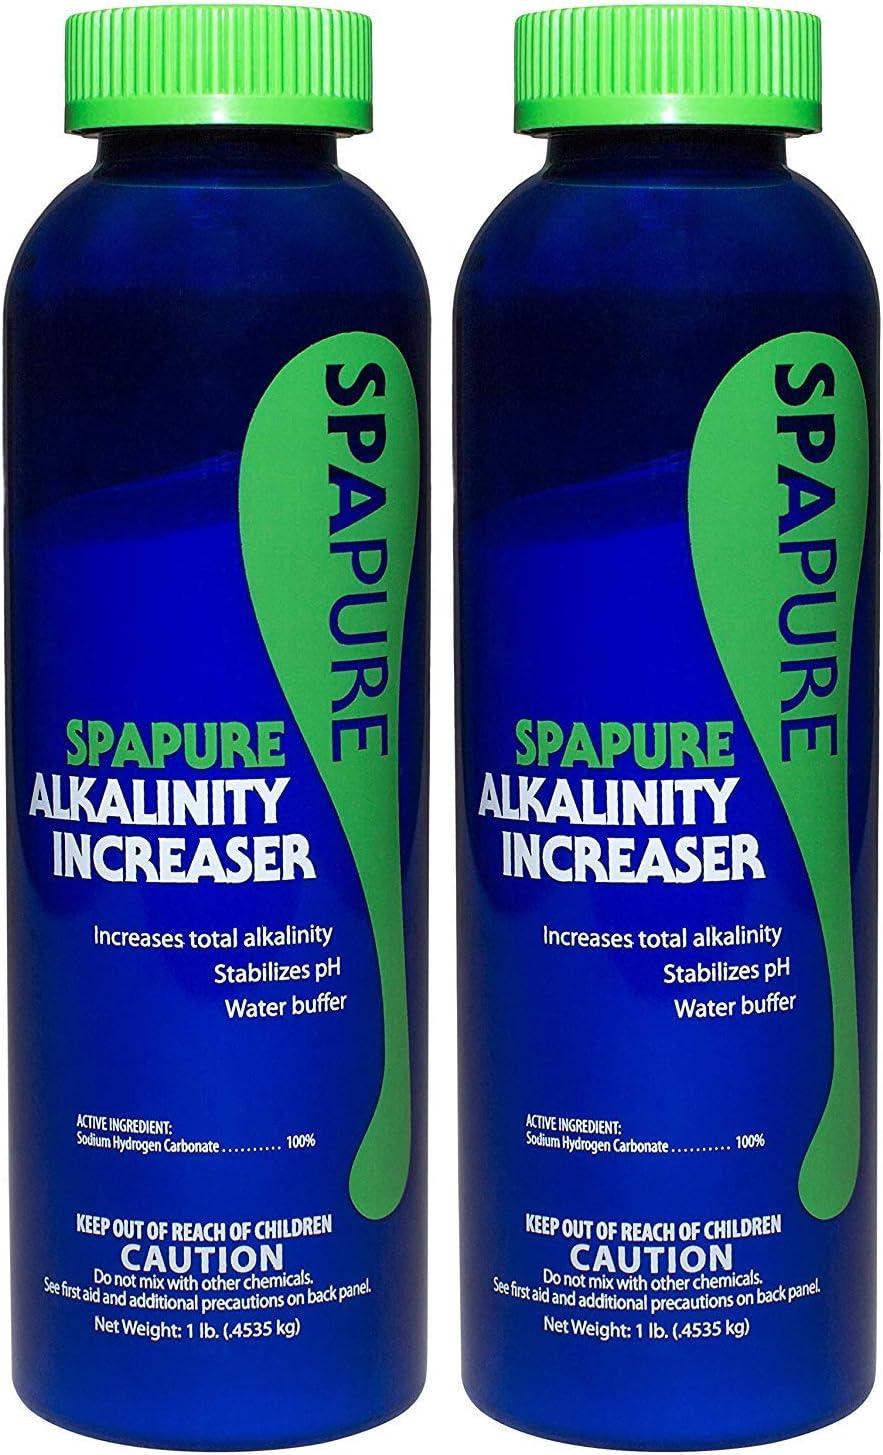 PureSpa SpaPure Alkalinity Increaser (1 lb) (2 Pack)